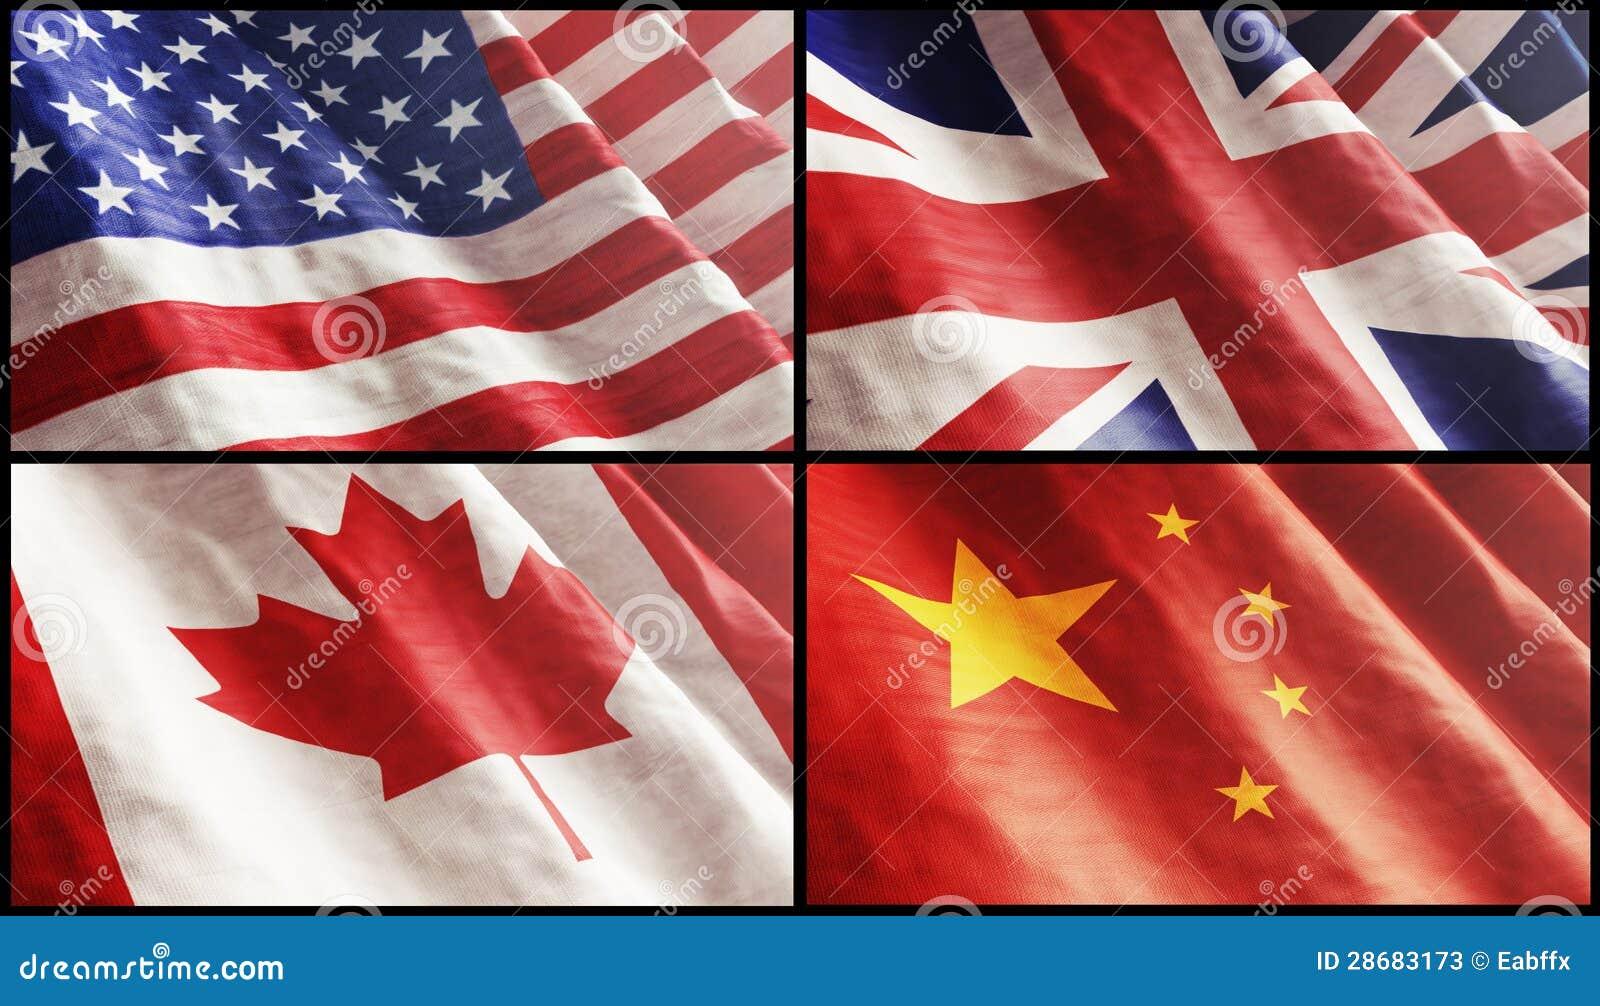 Flags XL USA England Canada And China Stock Photos